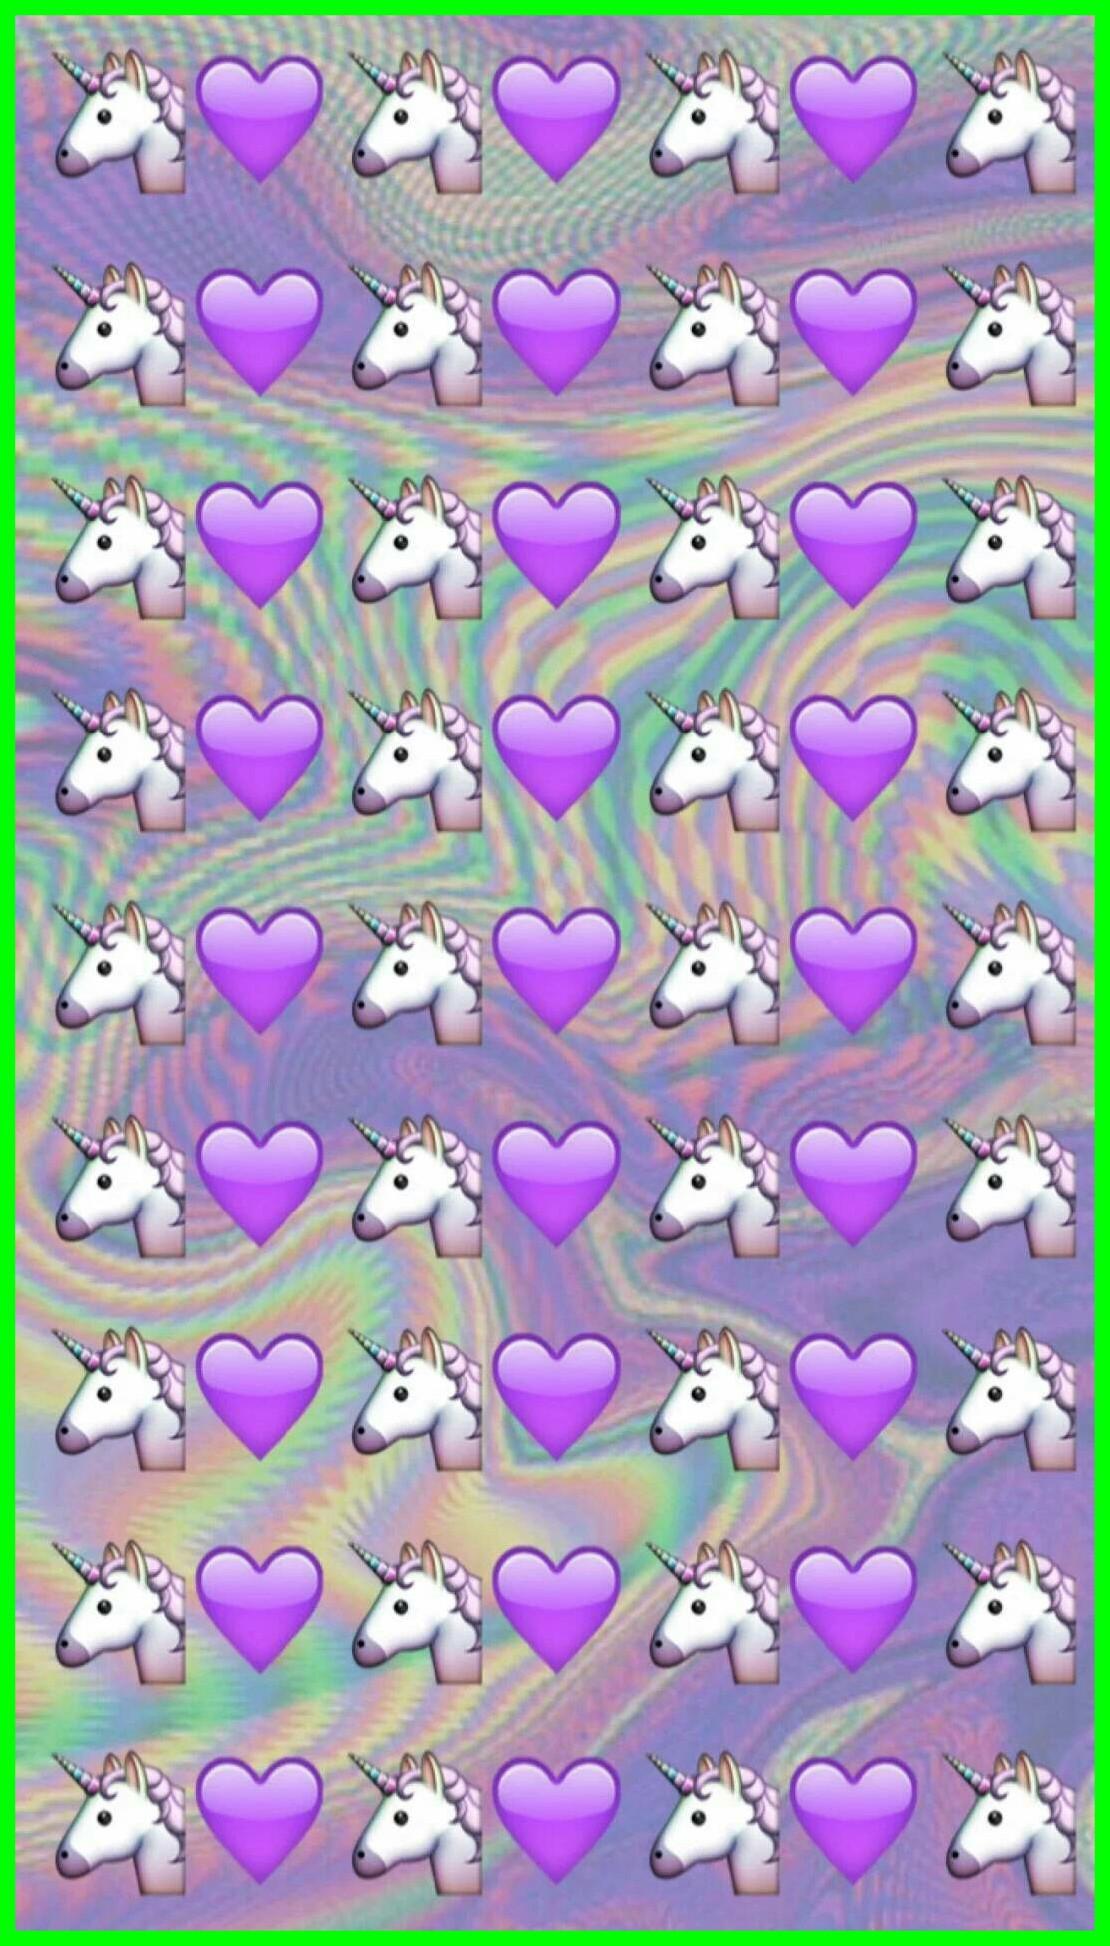 Iphone Wallpaper Unicorn Cute 422x750 Download Hd Wallpaper Wallpapertip